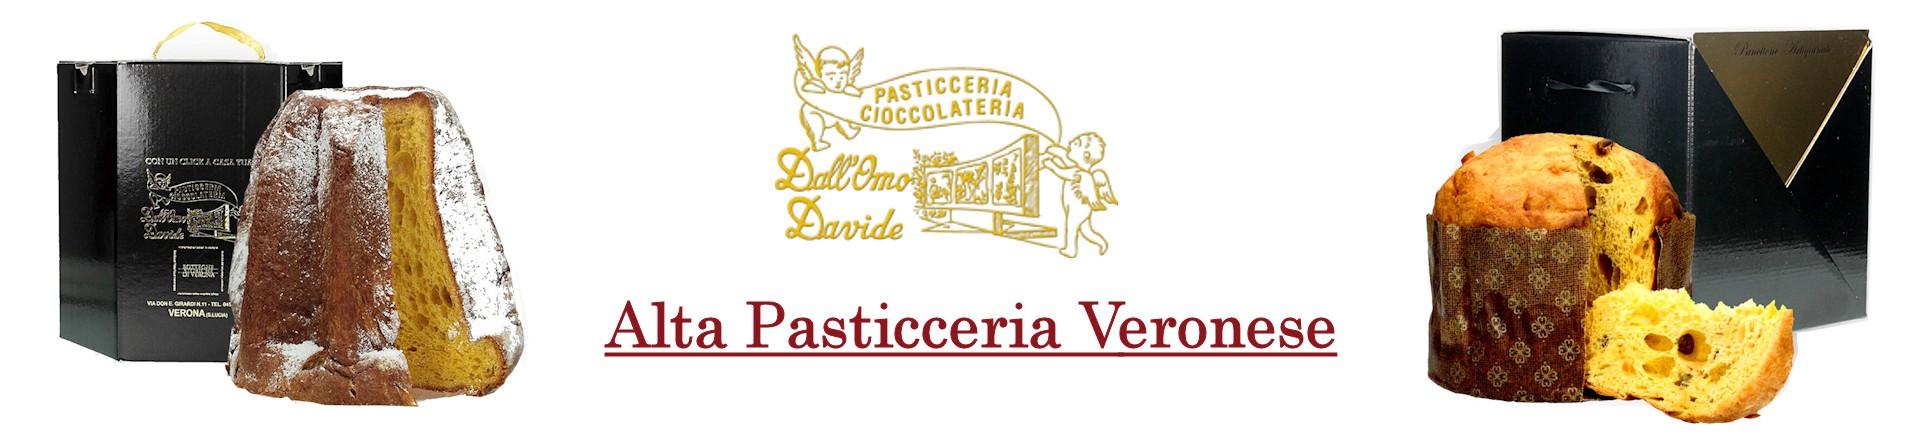 vendita online pandoro artigianale DALL'OMO DAVIDE acquista online